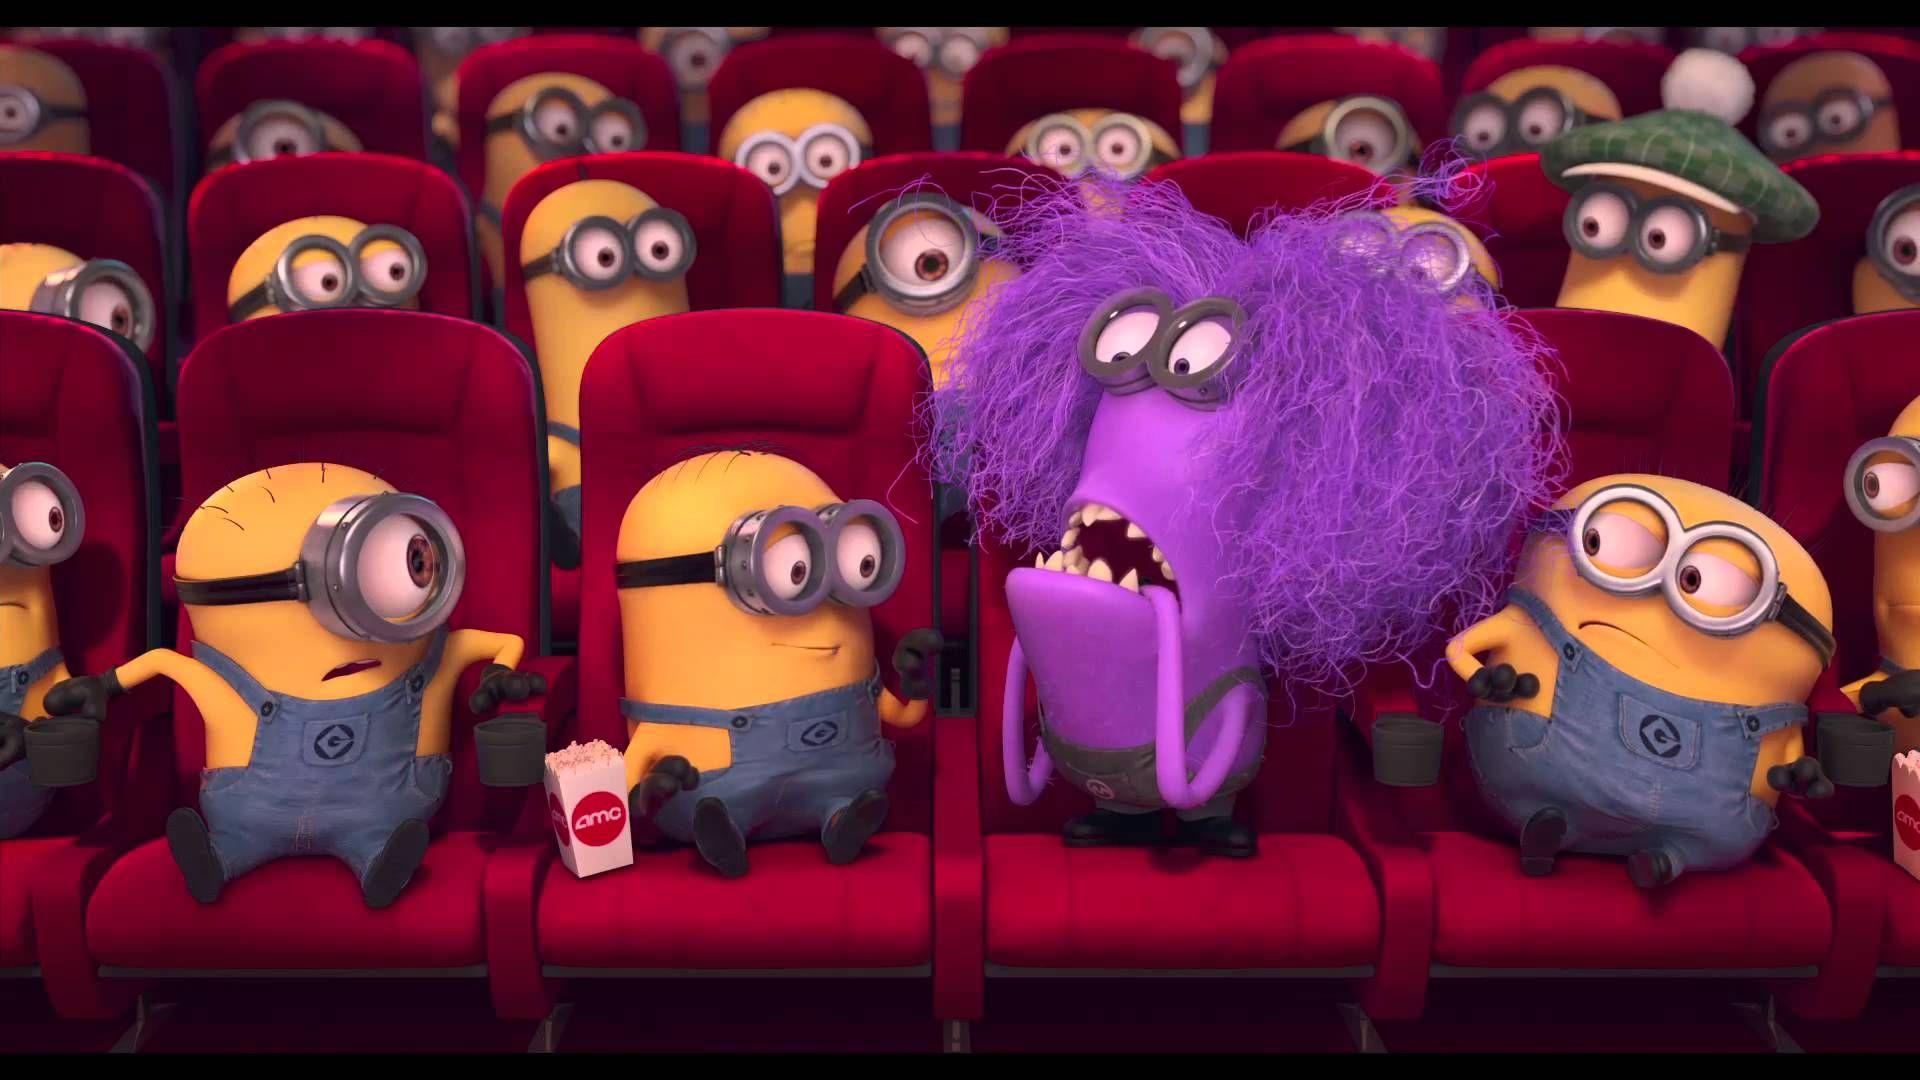 Download Filme Meu Malvado Favorito 2 2013 Dual Audio Filmes Download Filmes Filmes Infantis